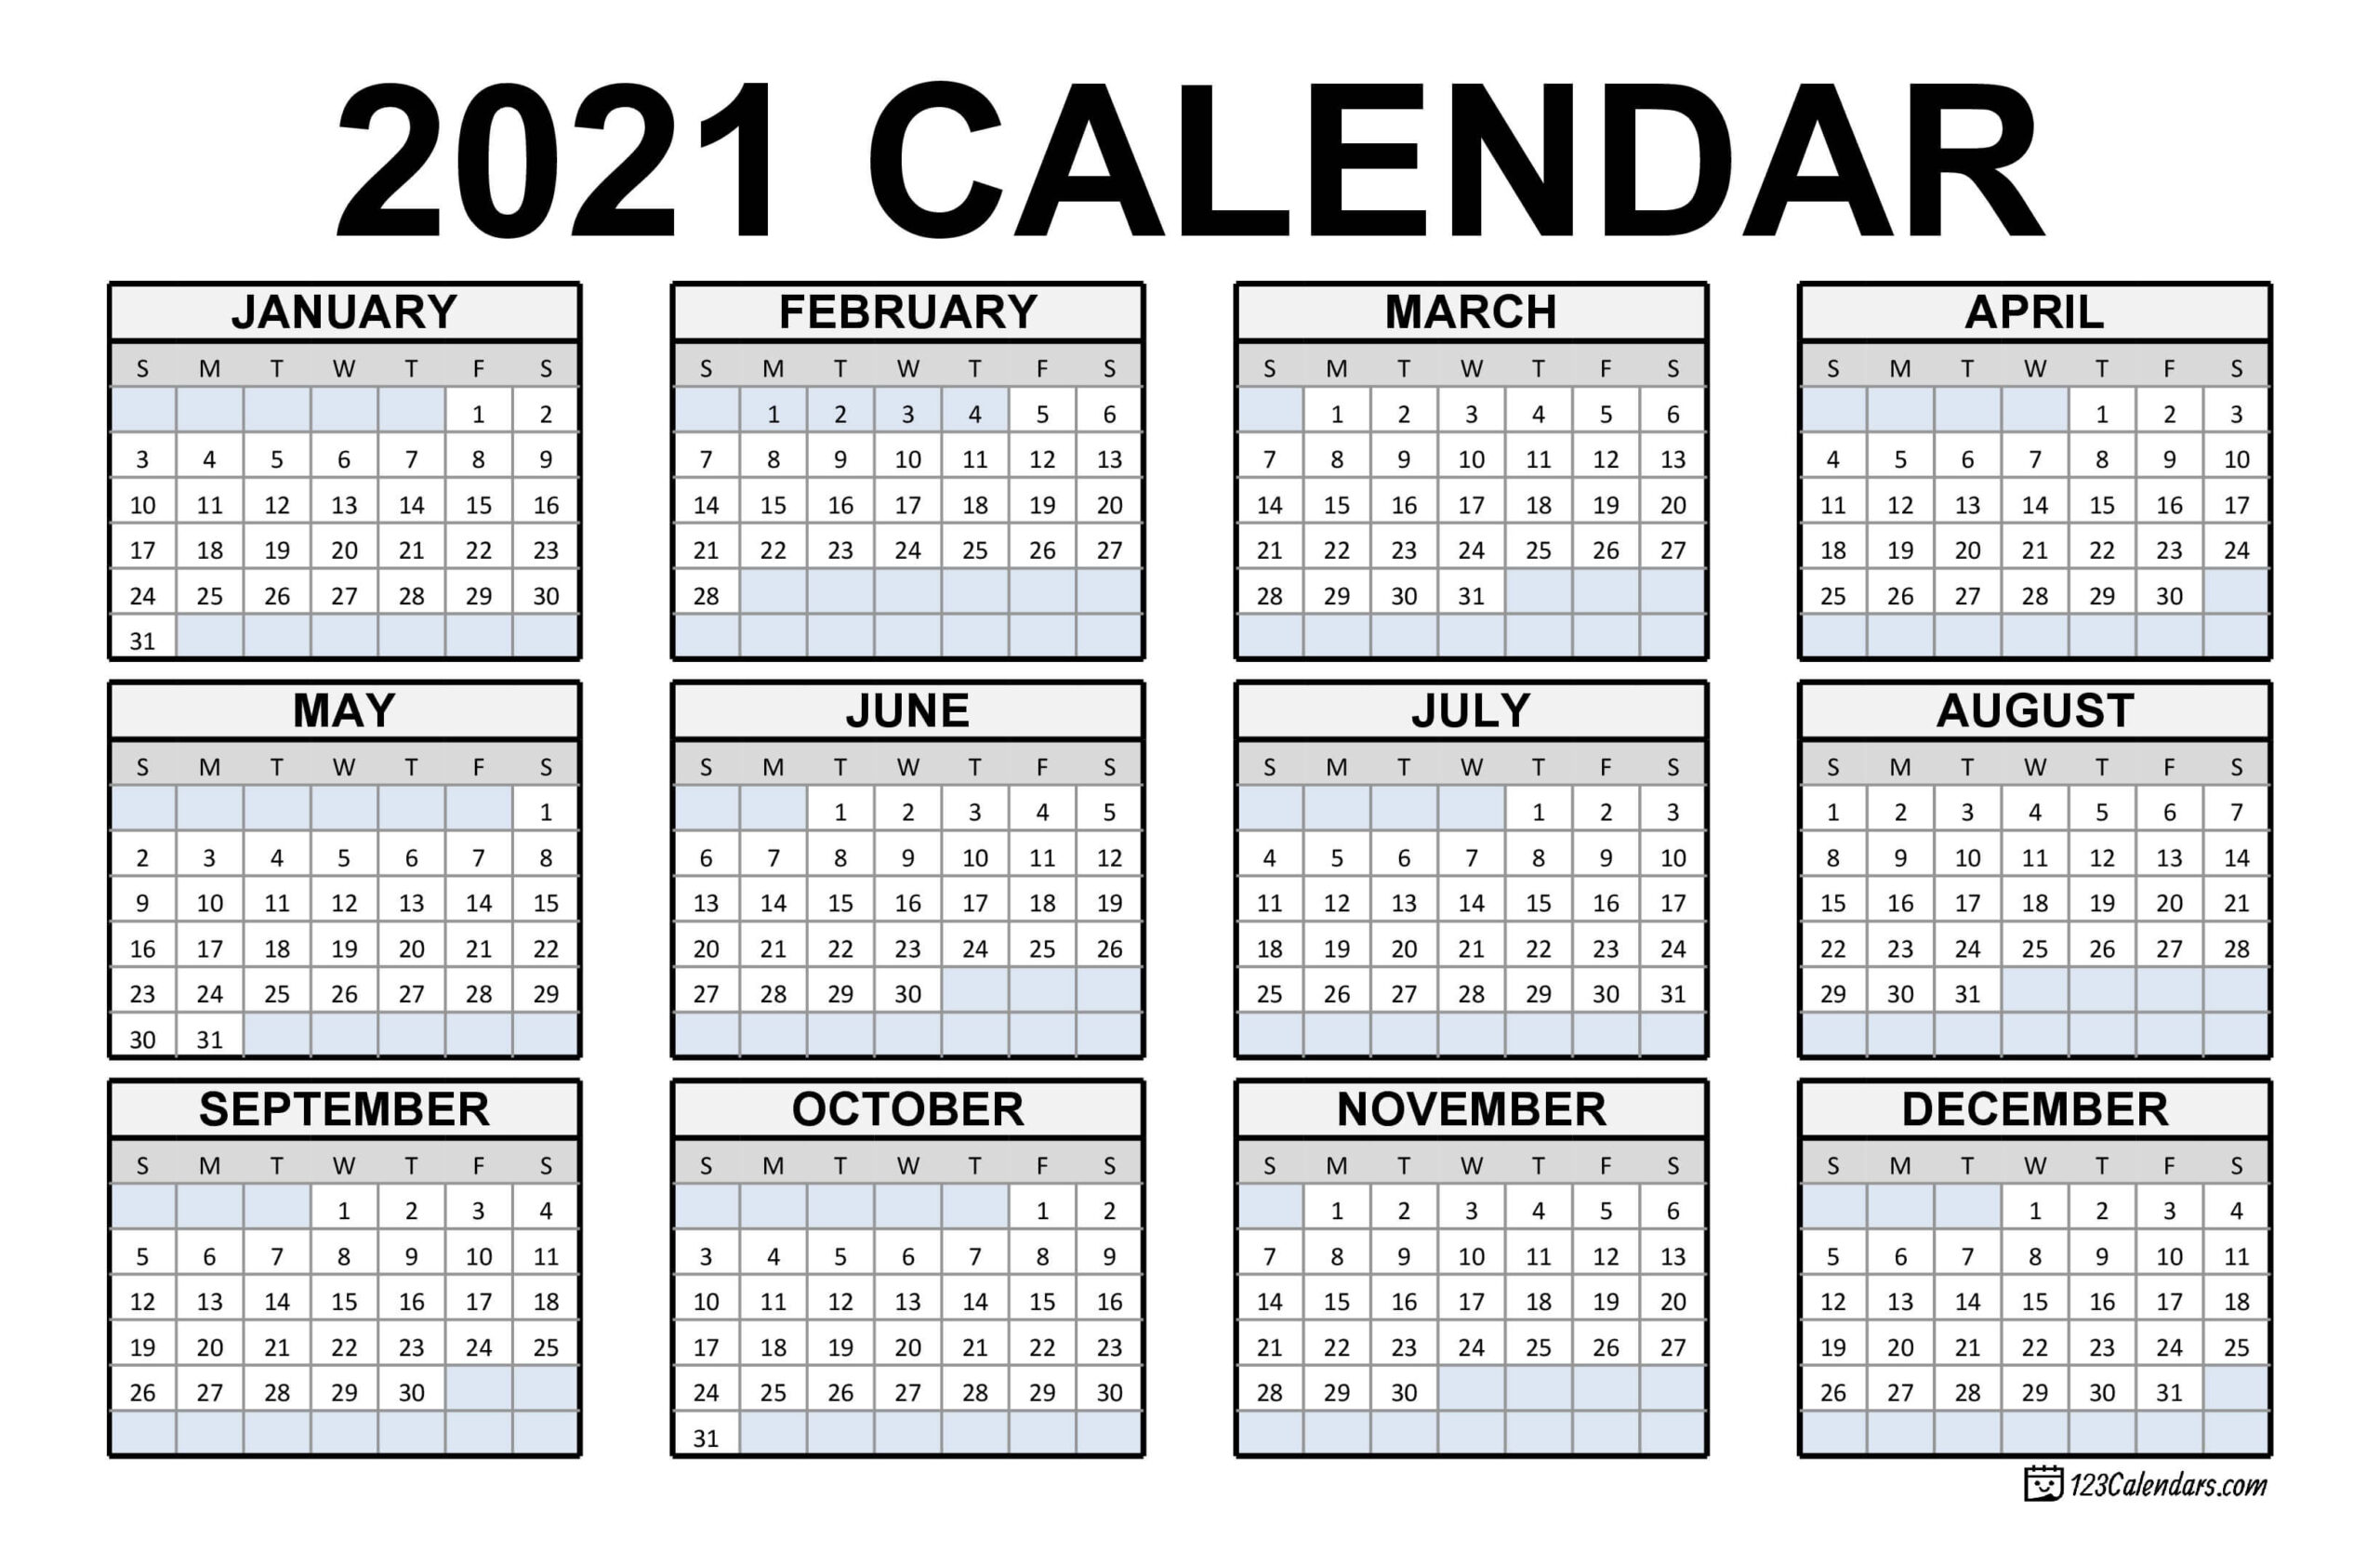 2021 Printable Calendar | 123Calendars pertaining to 2021 Printable Pocket Calendars